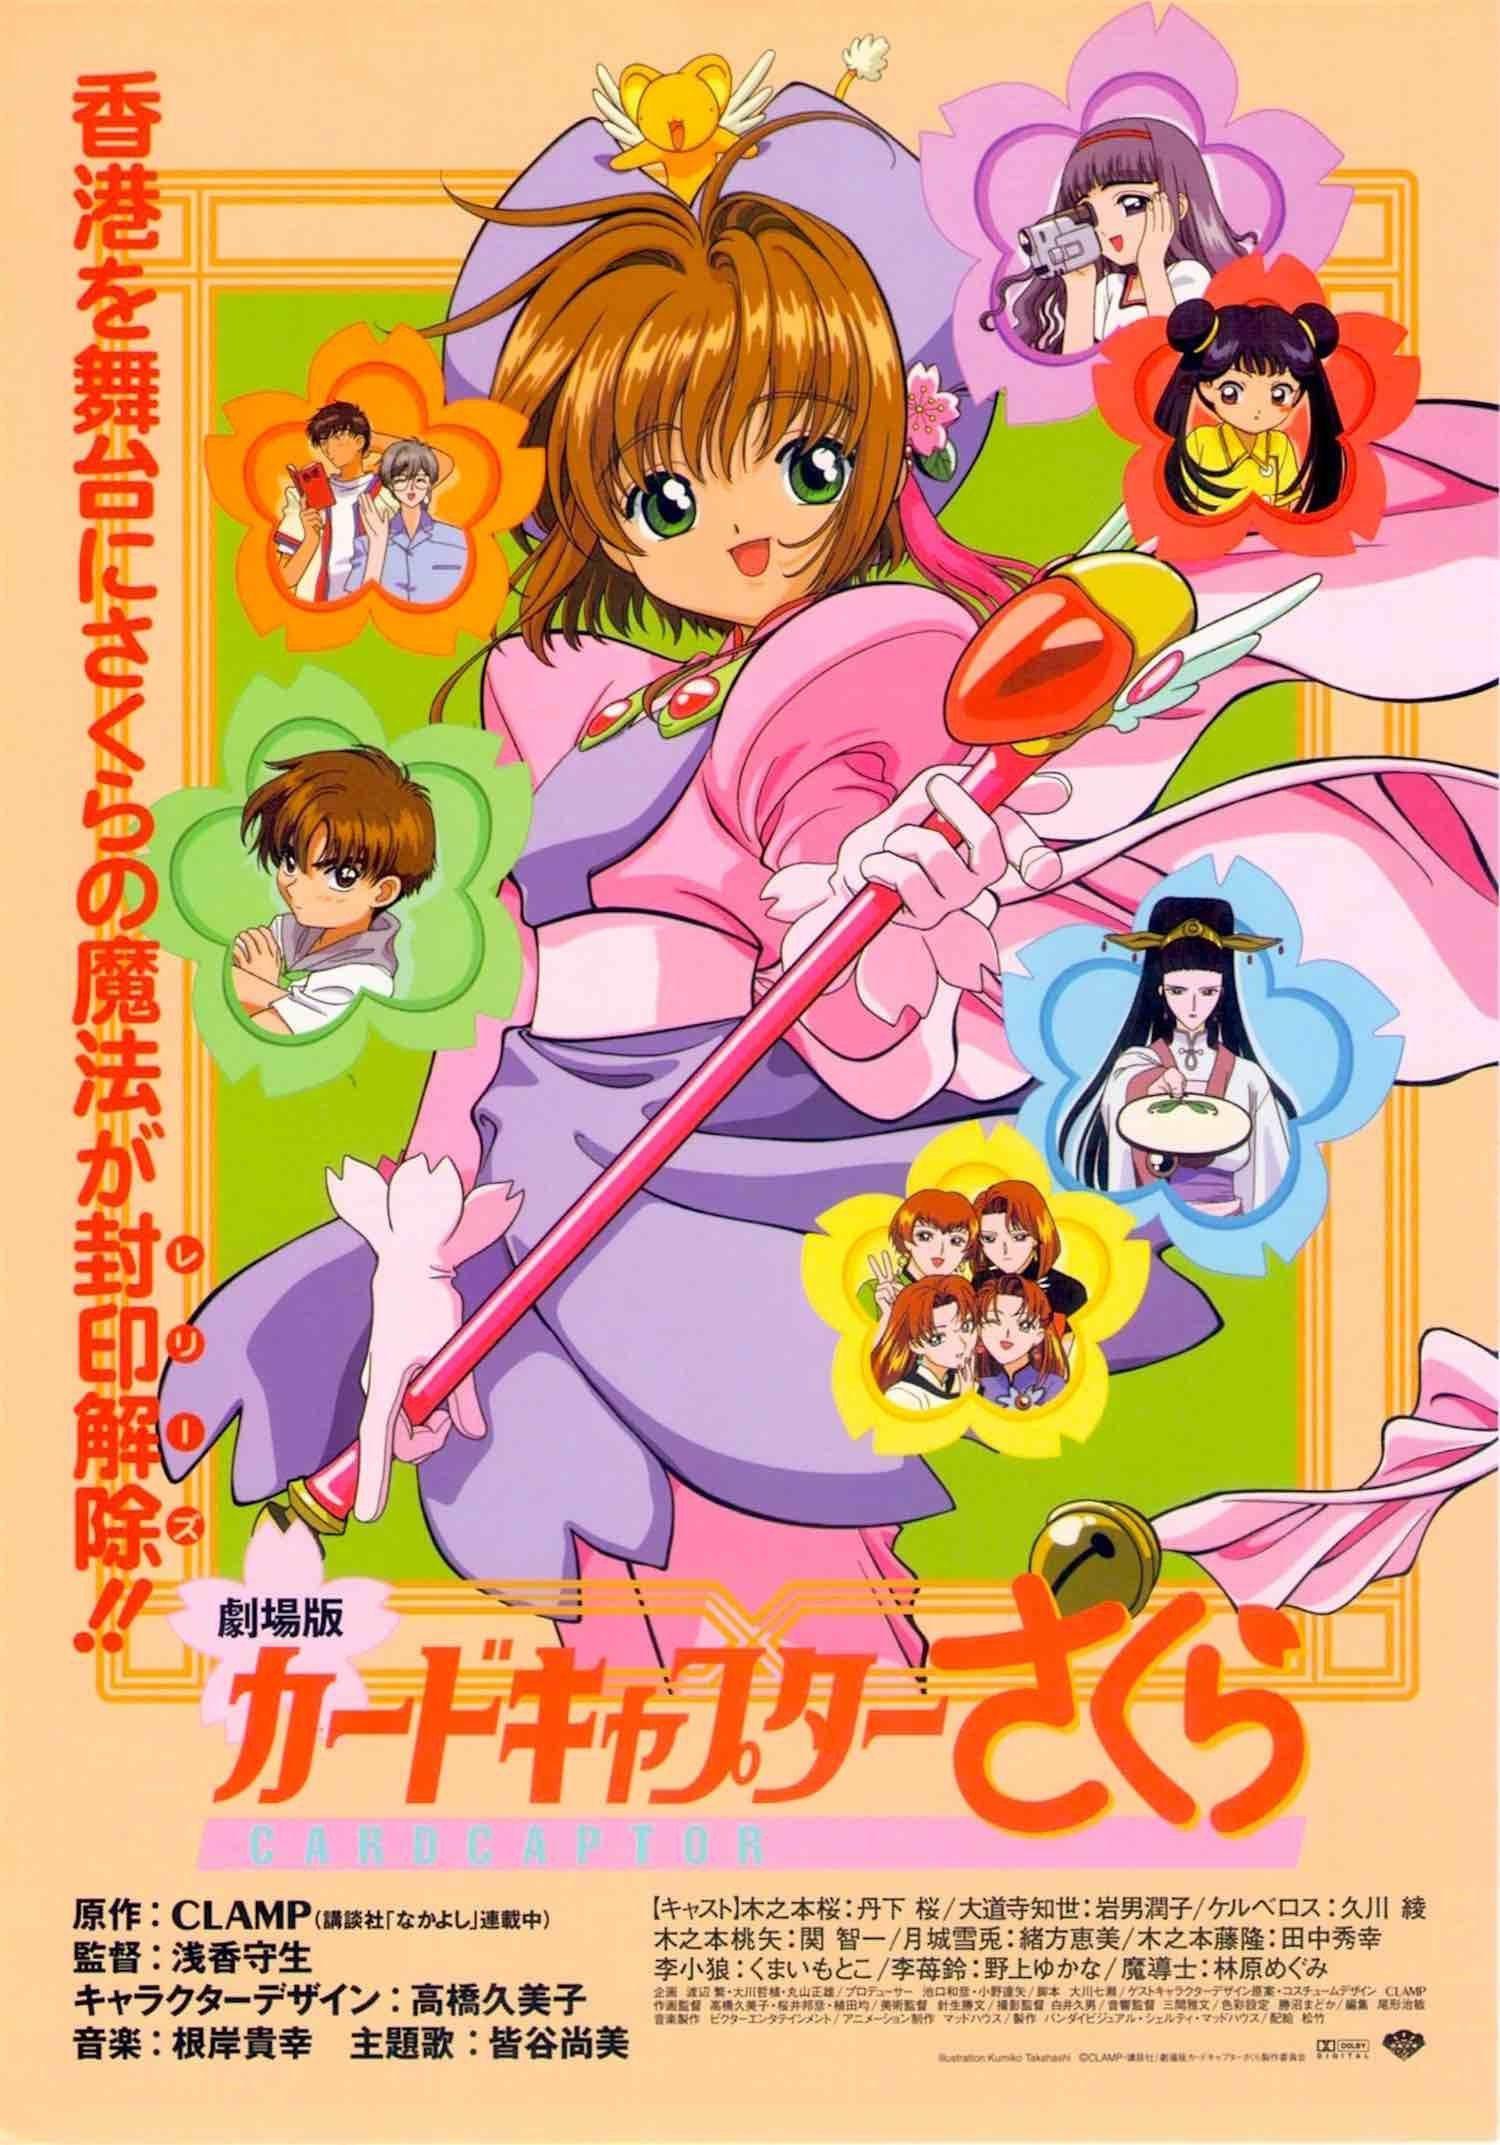 Cardcaptor Sakura 90s Classic Anime 1999 original